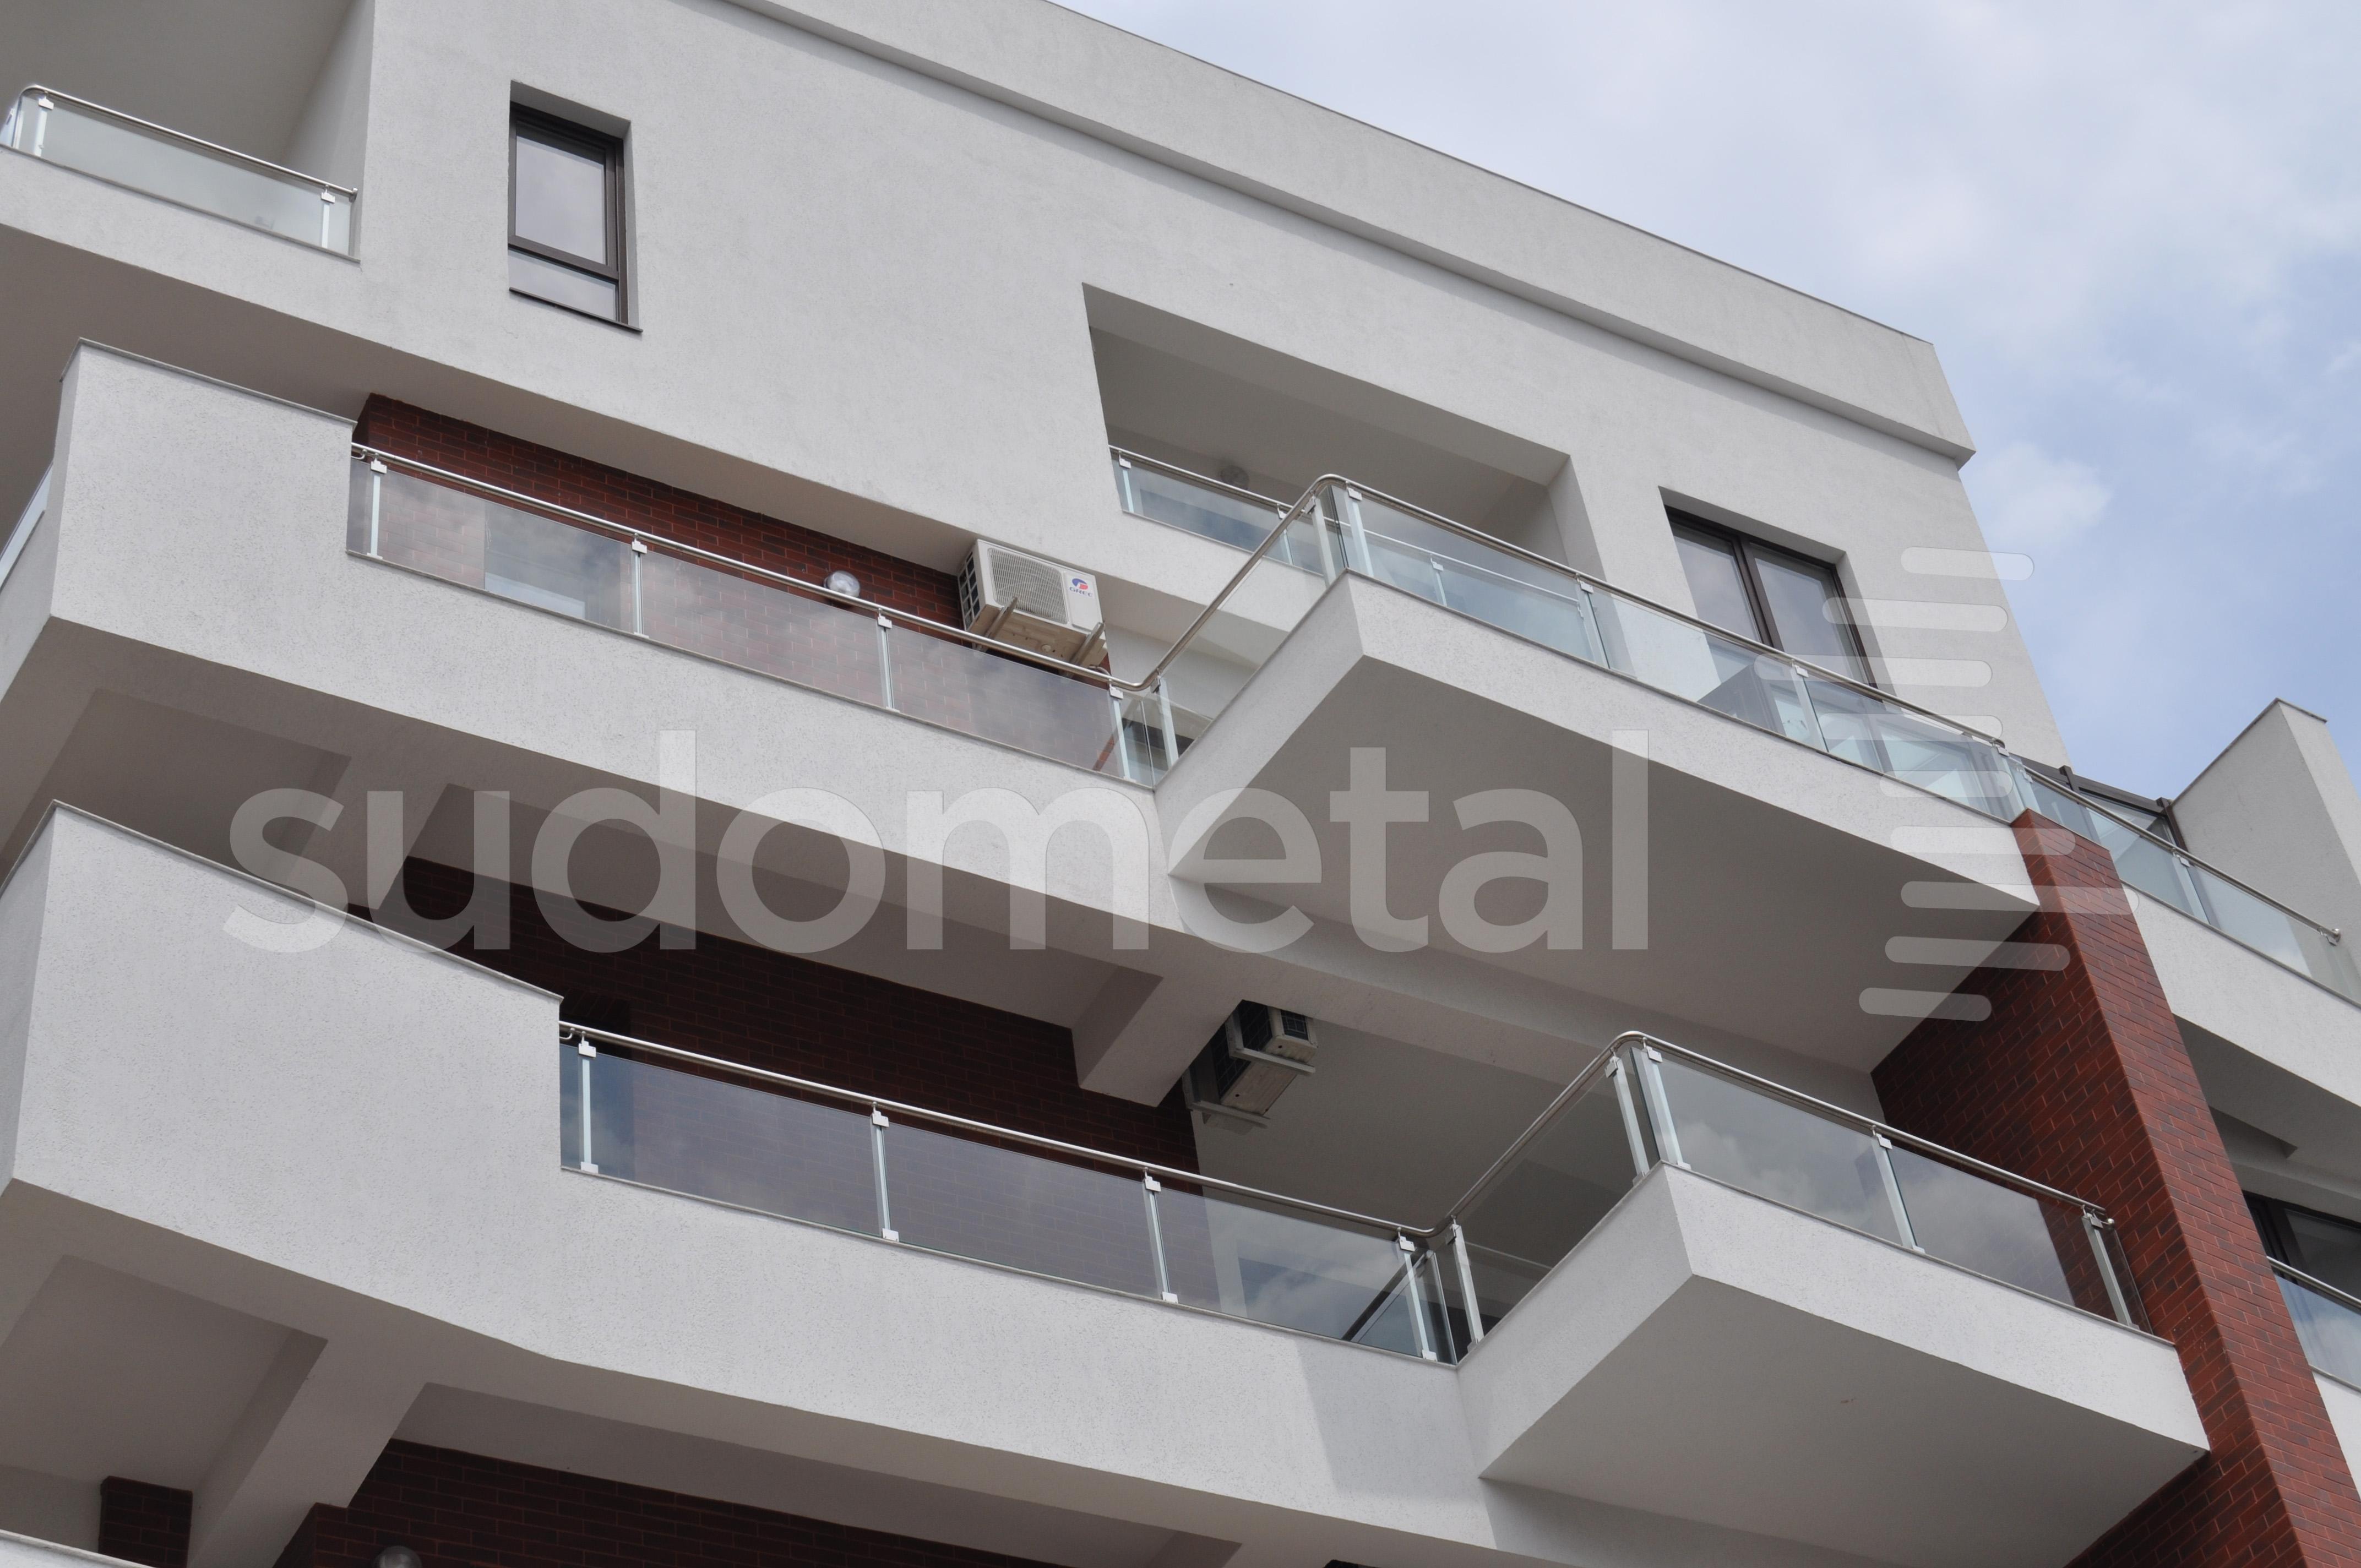 Balustrade exterioare - Balustrade Residence Inn Dorobanti, Bucuresti SUDOMETAL - Poza 2